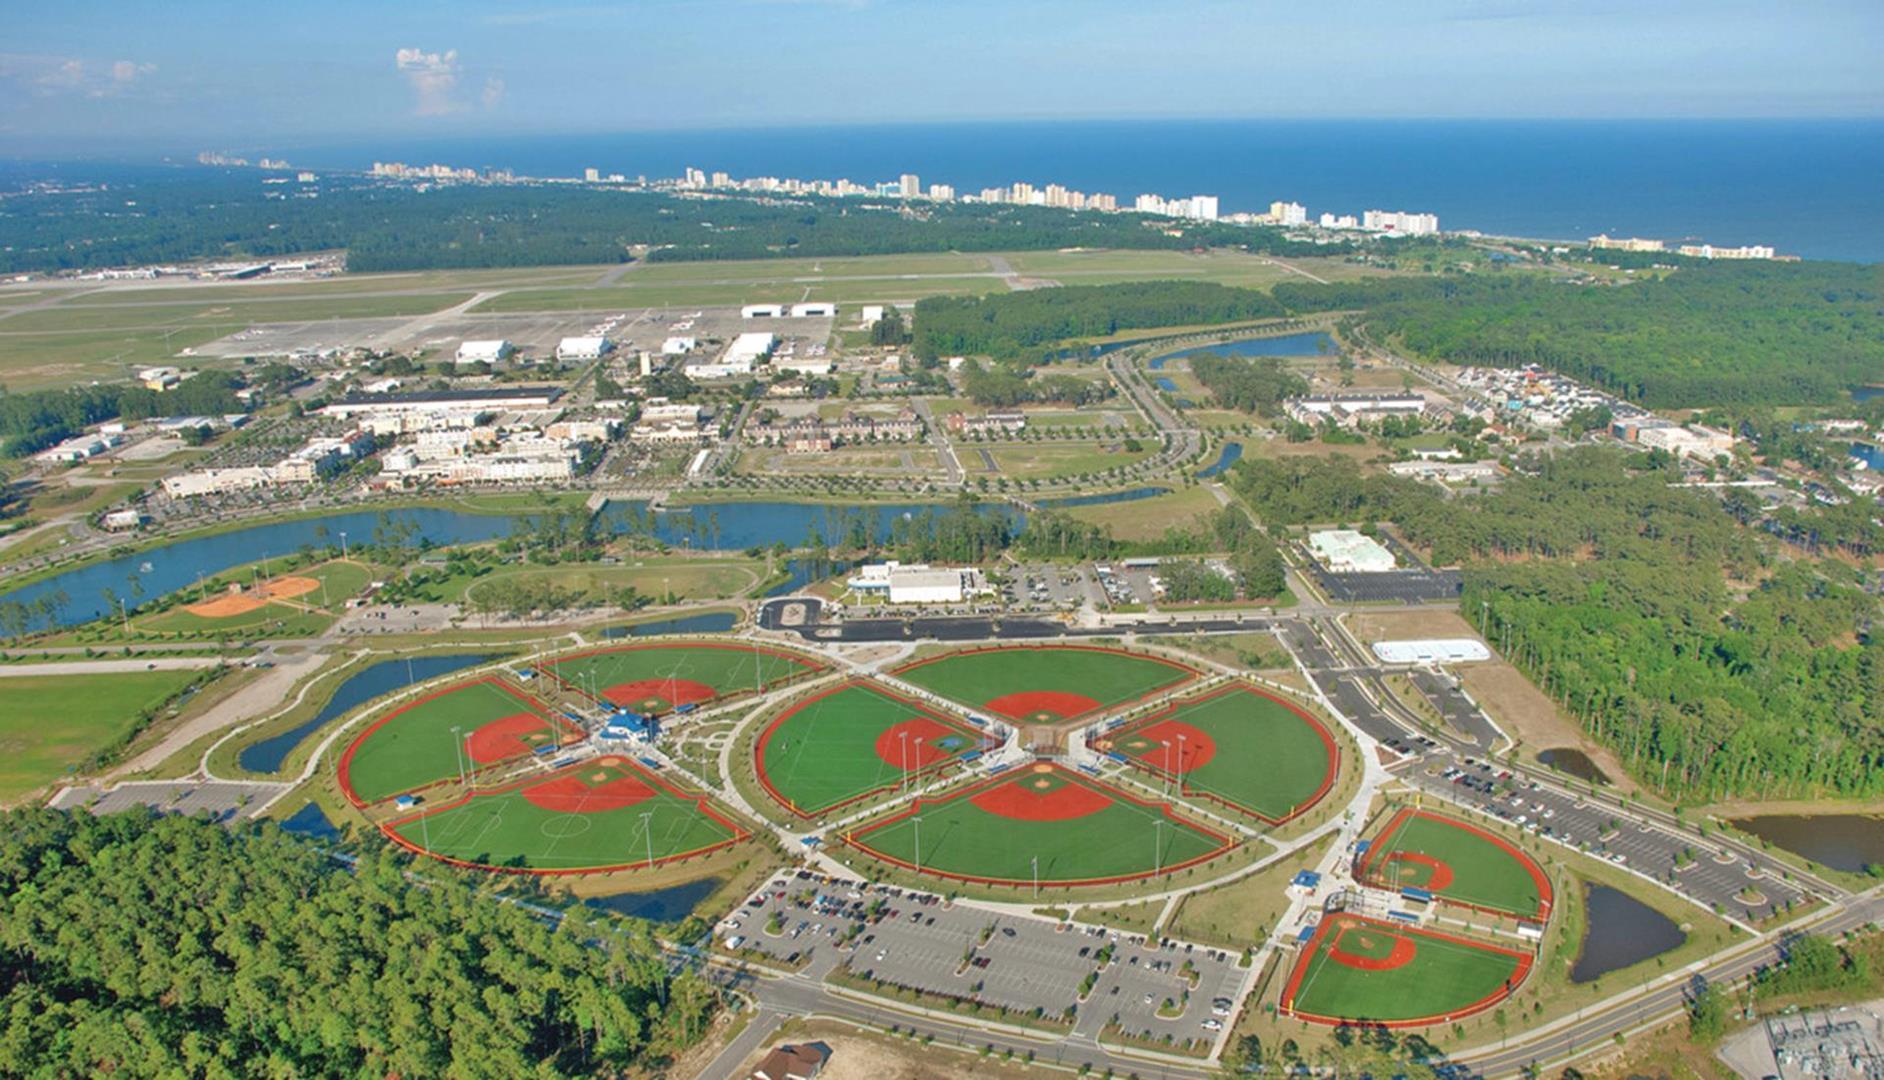 14 Top Baseball Facilities for 2016